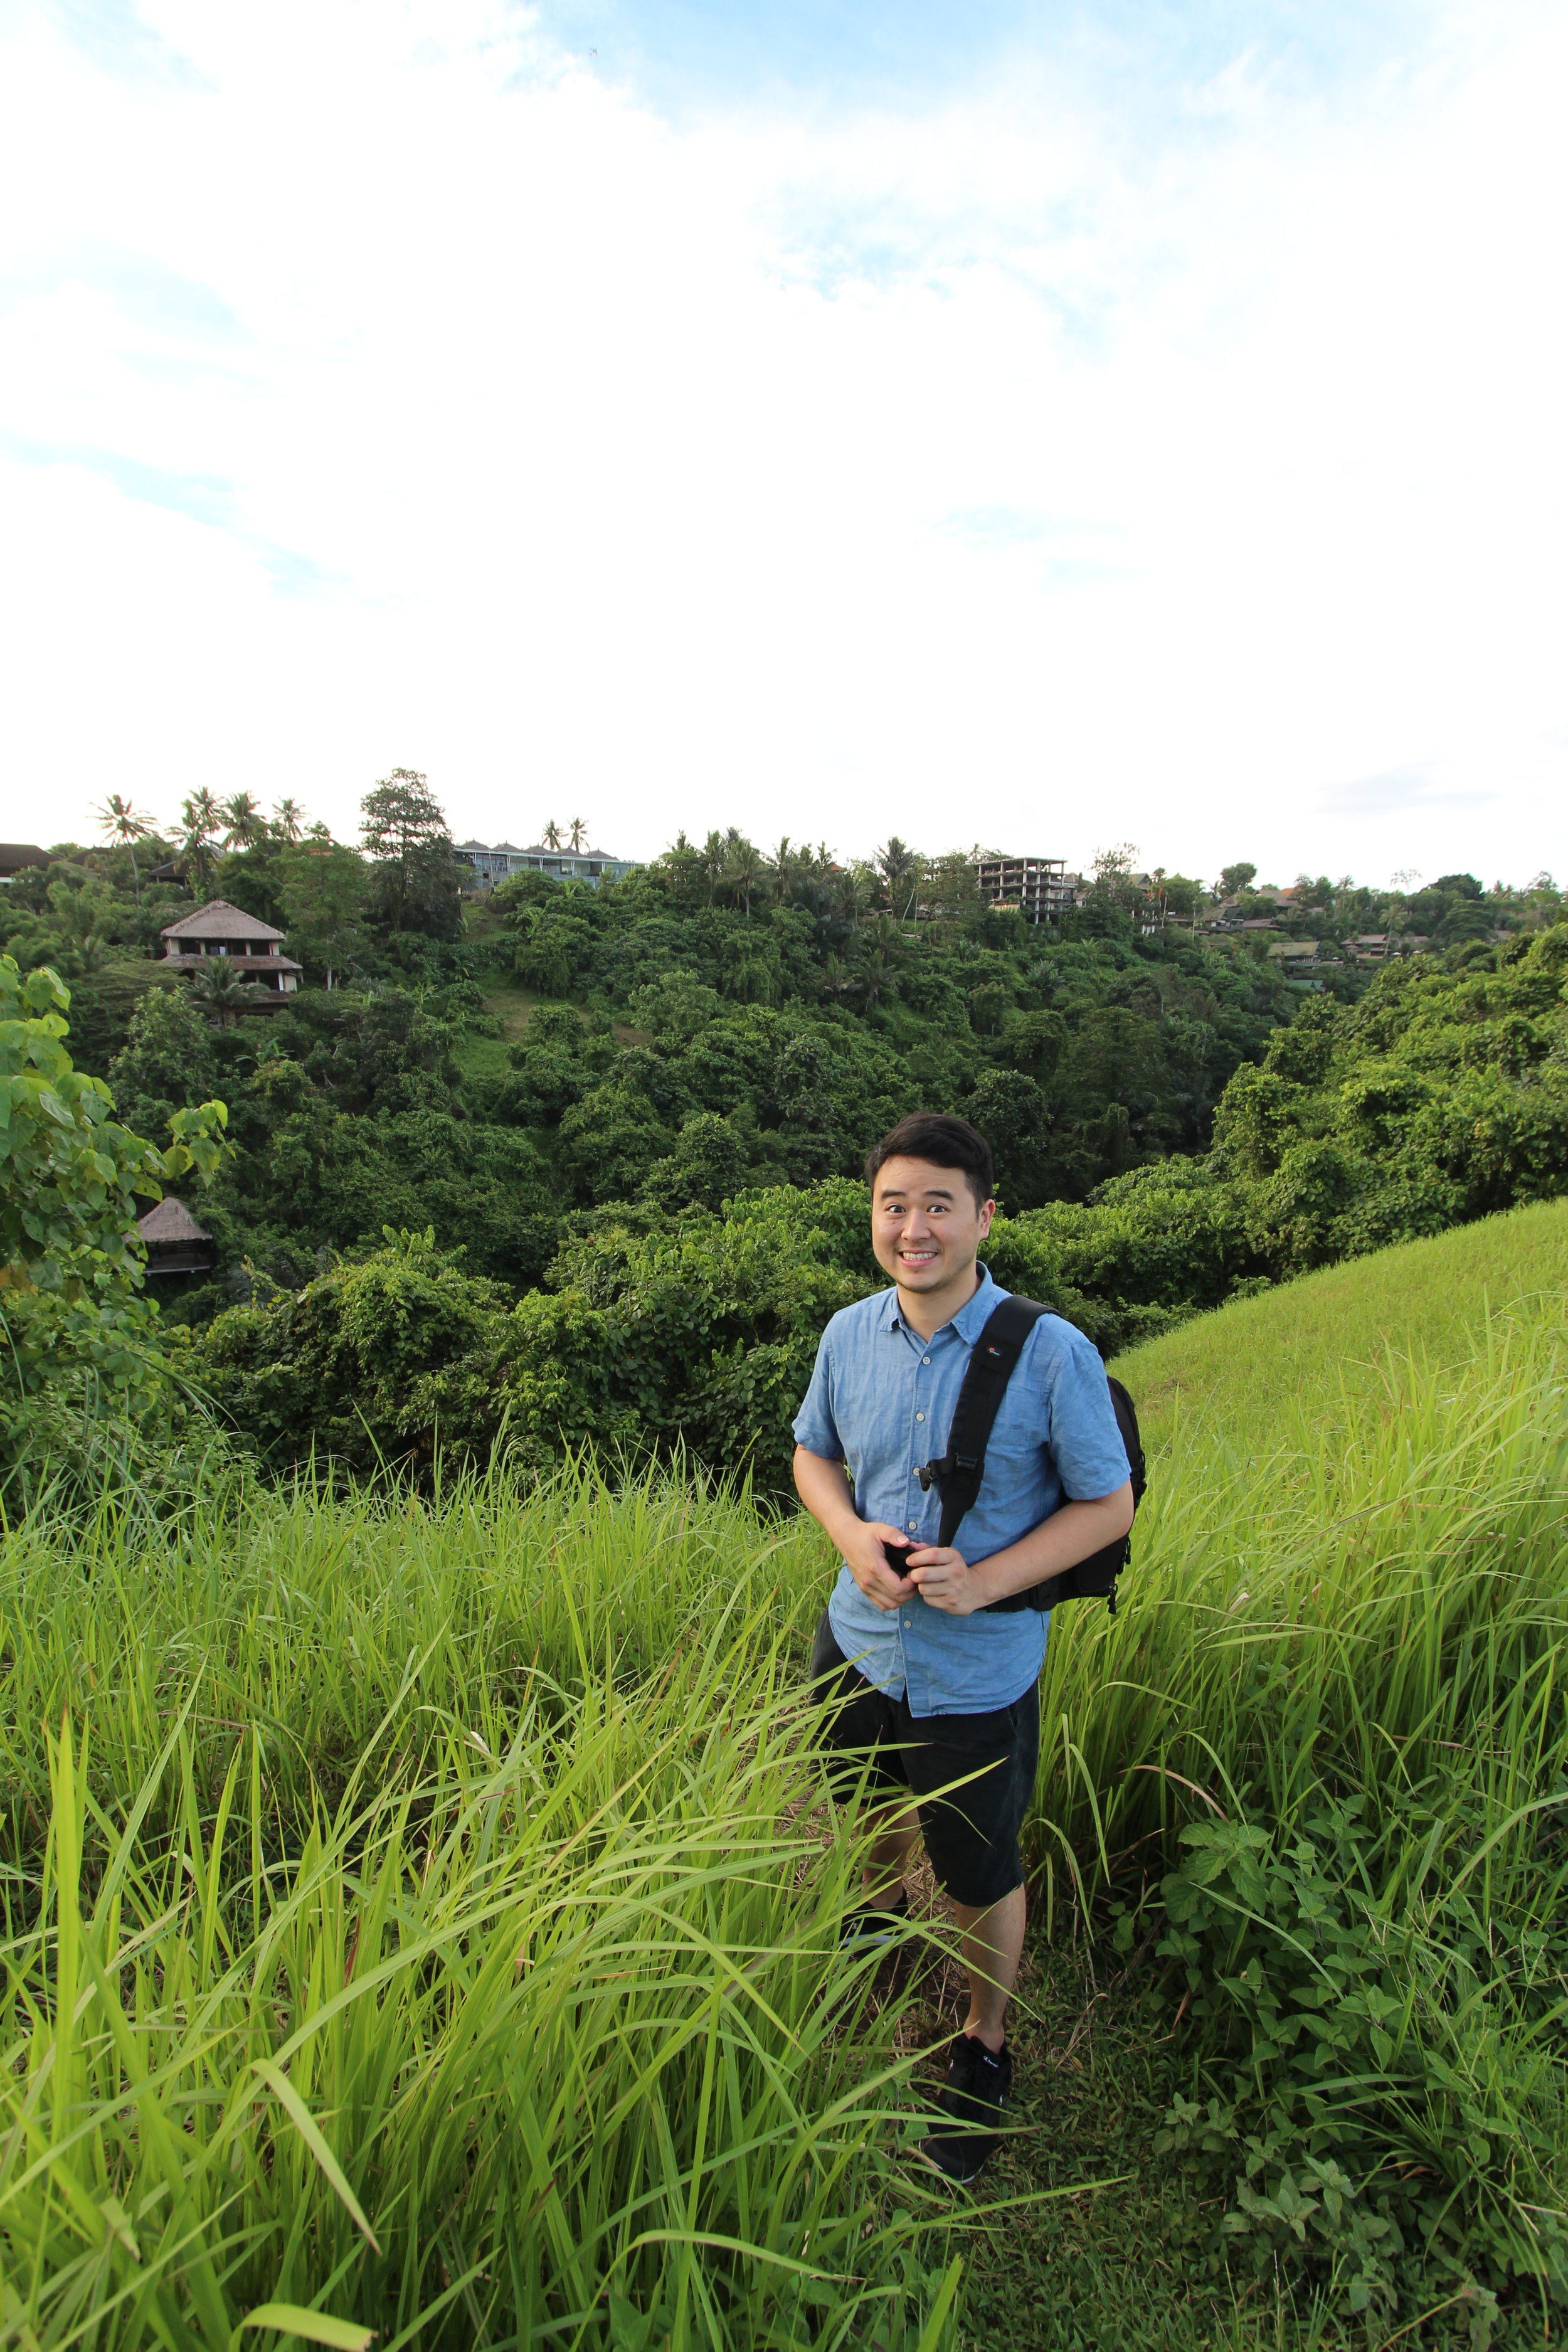 Me in Wazuka, Kyotoat the Obubu Tea Farms office.